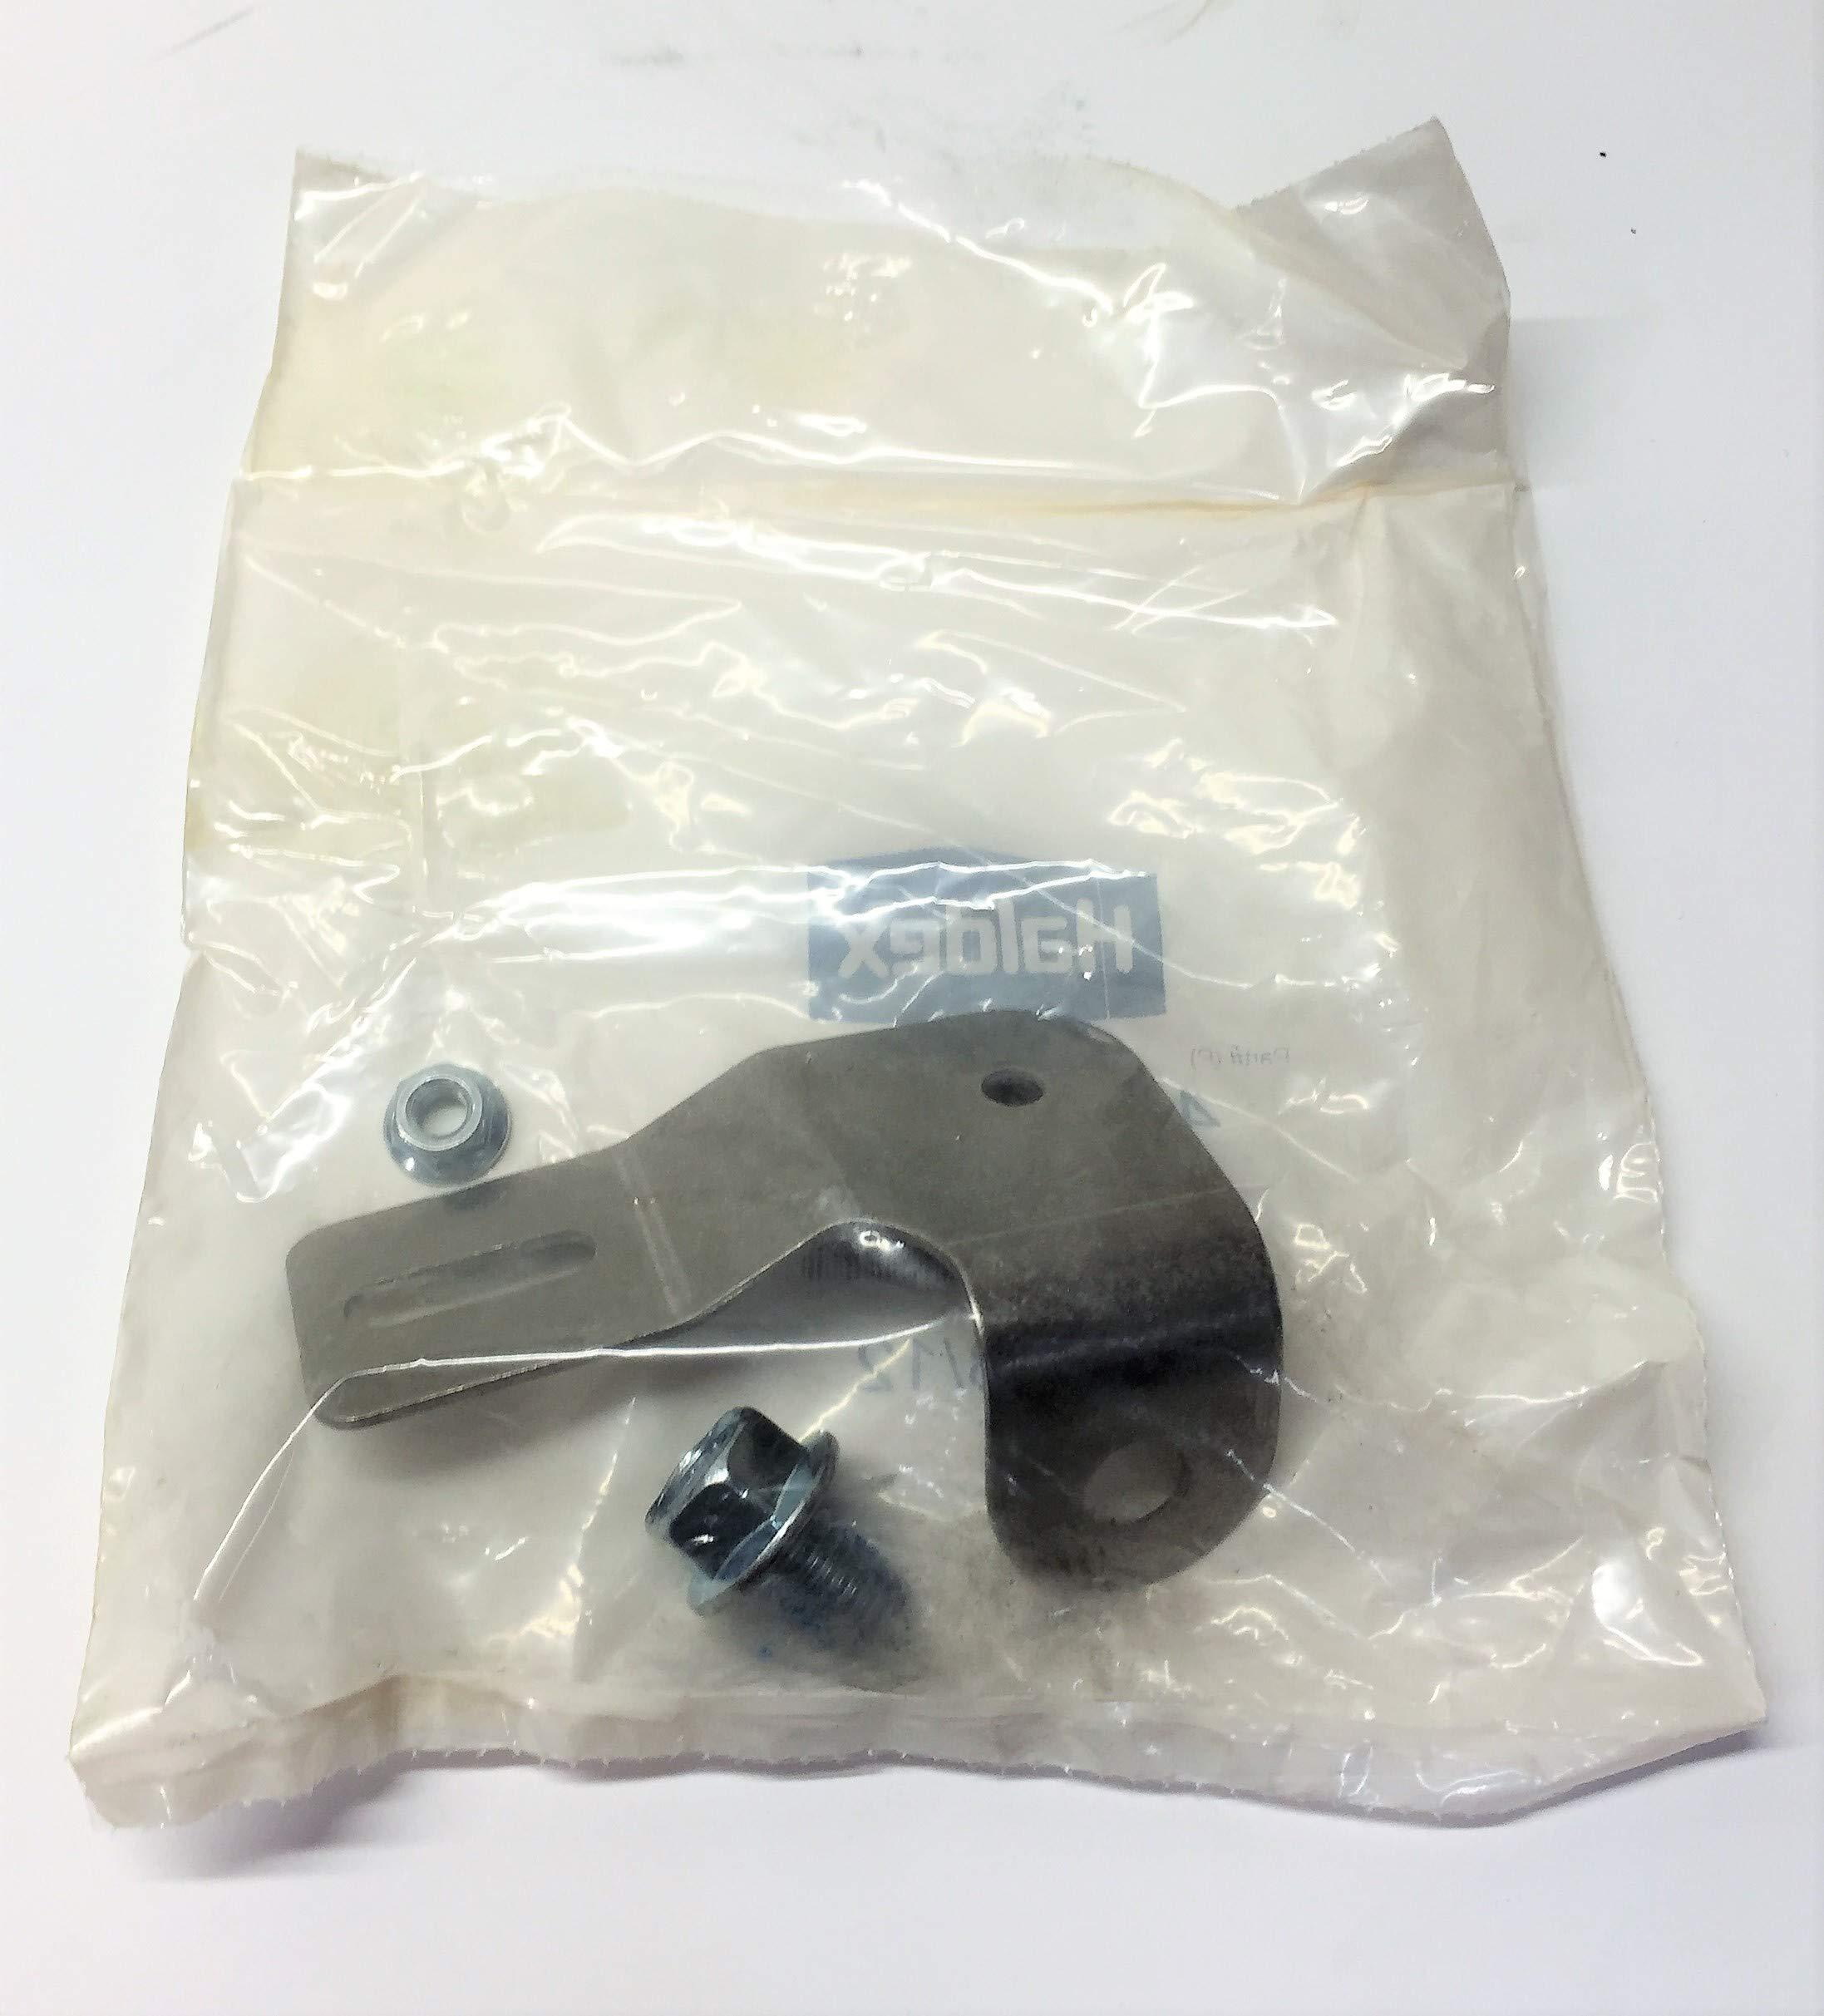 Haldex Automatic Brake Adjuster 300-10001 by Haldex (Image #6)